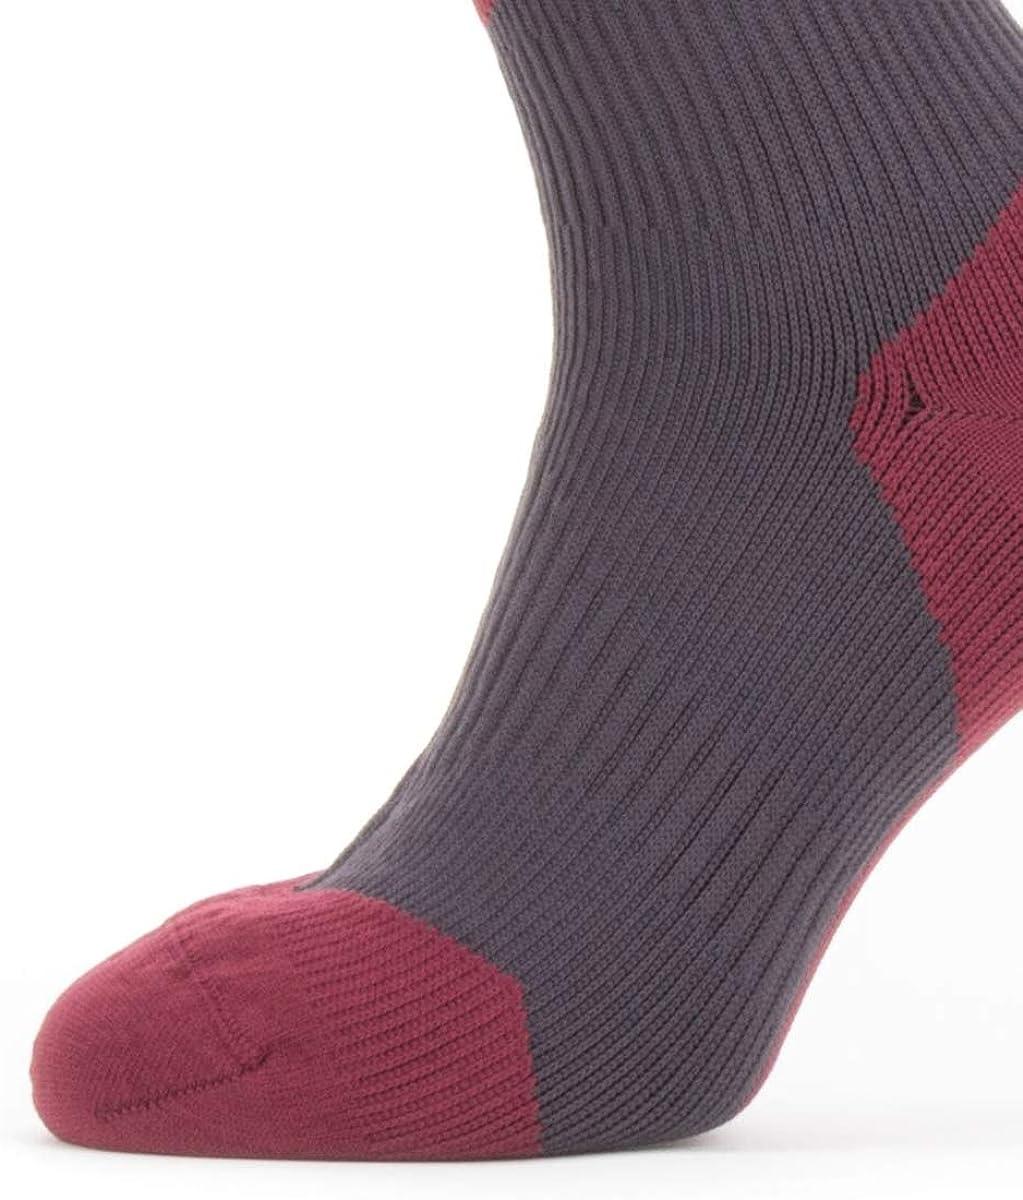 SealSkinz Waterproof Cold Weather Knee Length Sock